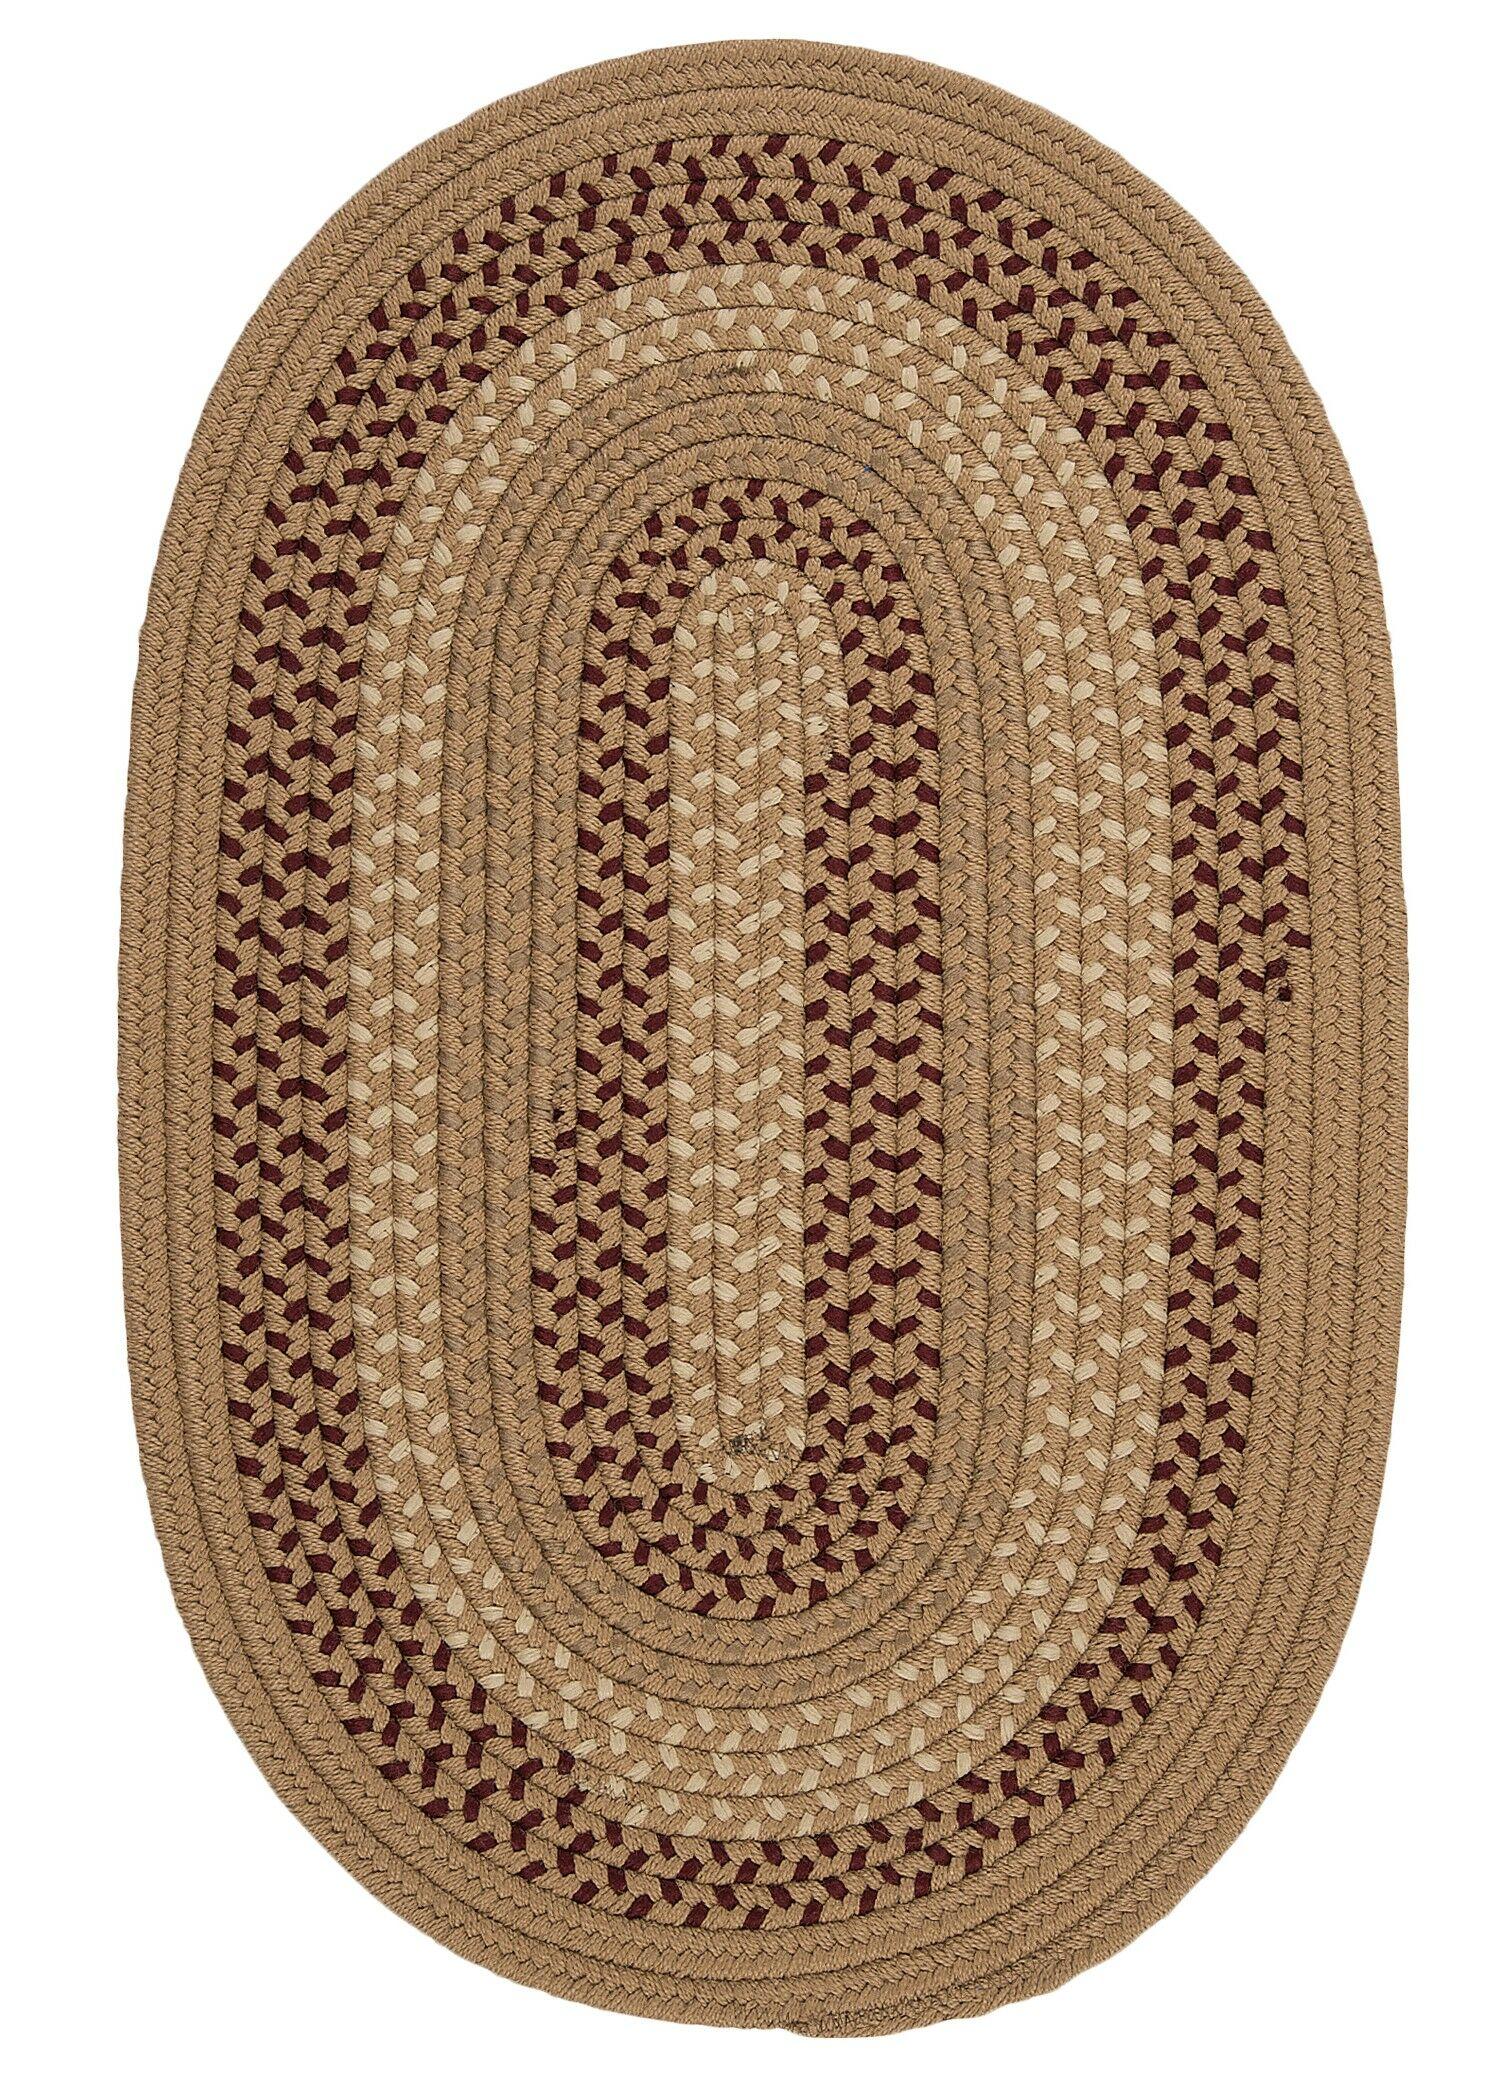 Omaha Taupe Indoor/Outdoor Area Rug Rug Size: Oval 3' x 5'